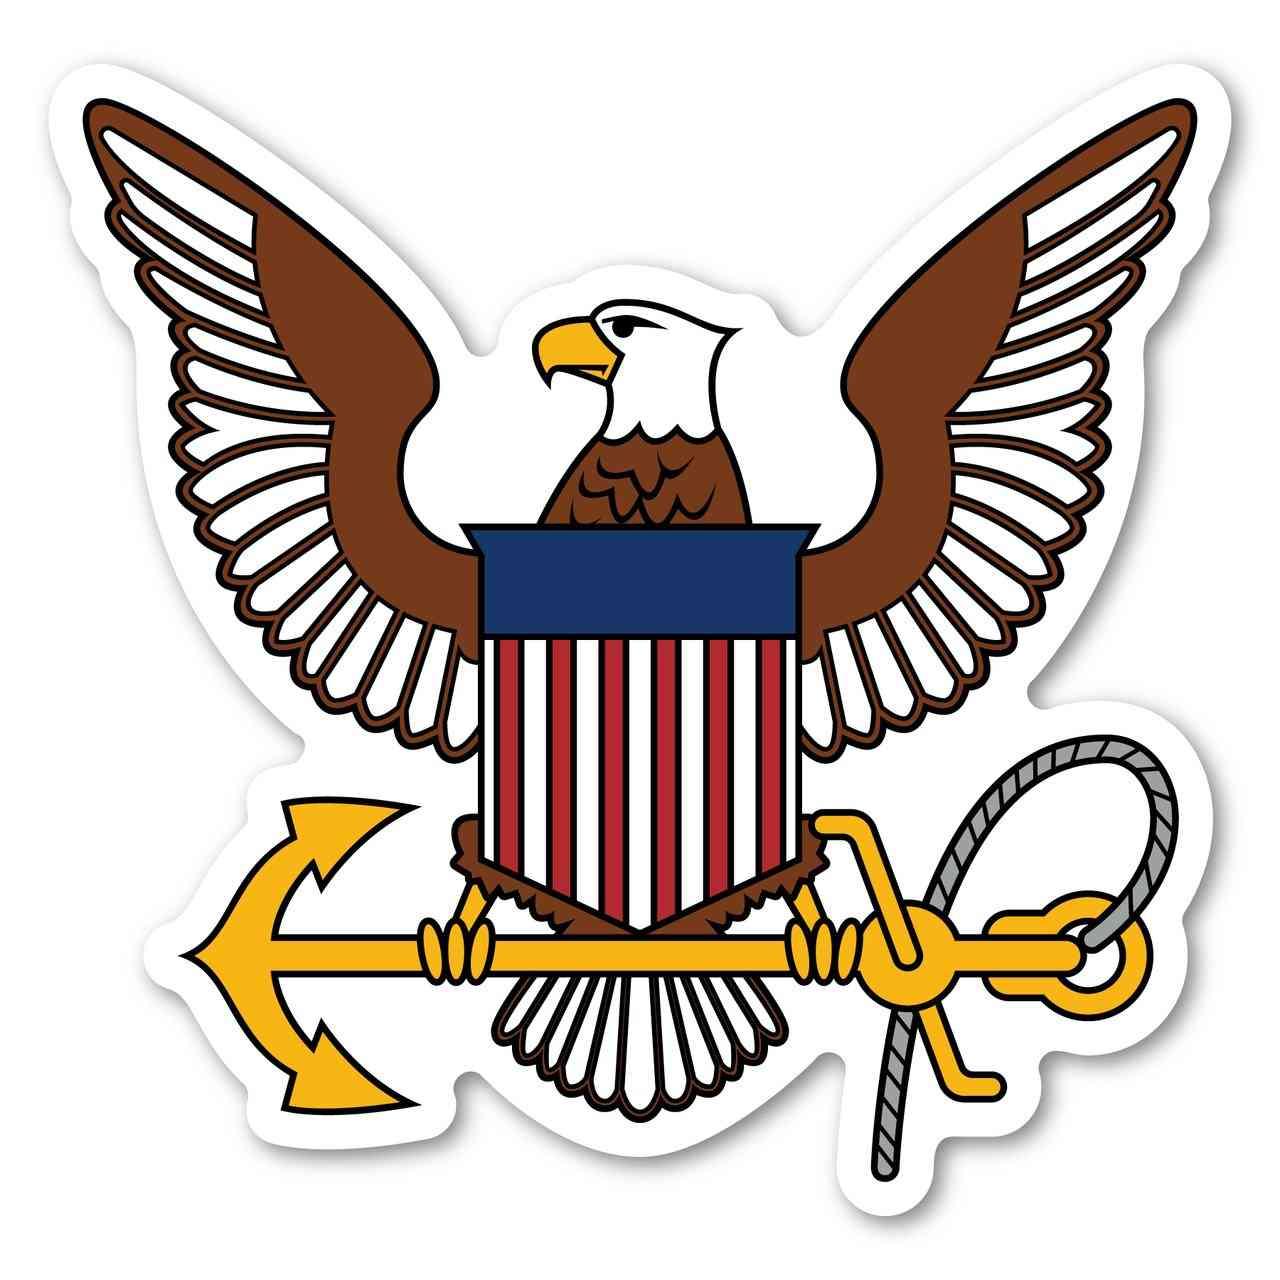 Magnet, United States Navy Logo Magnet, Usn, 4.75